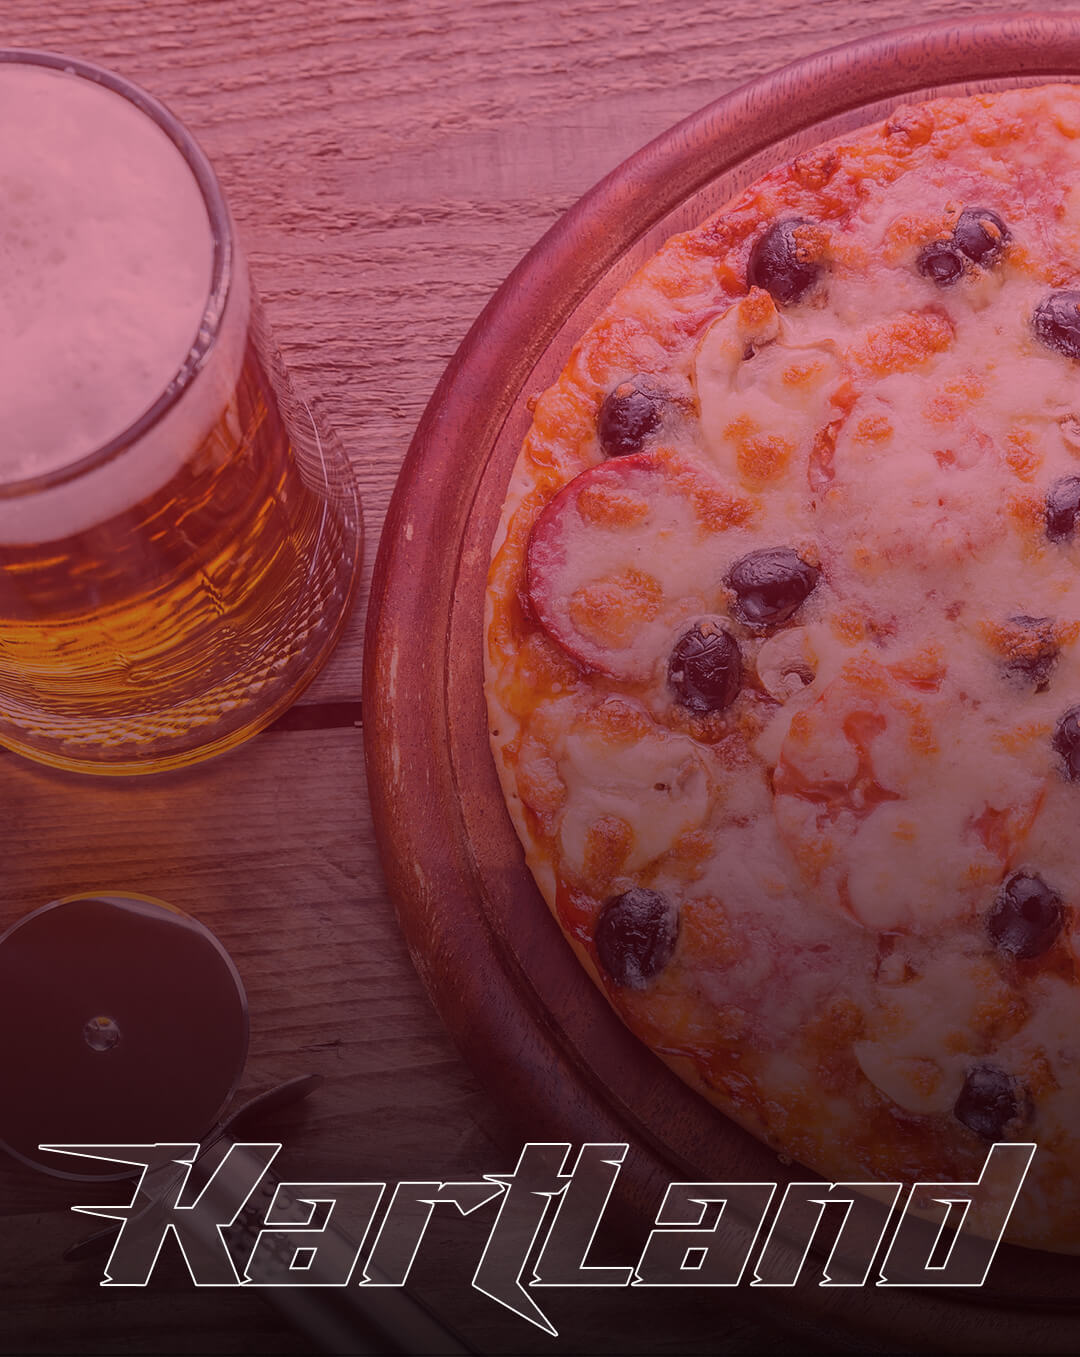 restoran-hrana kartland karting beograd